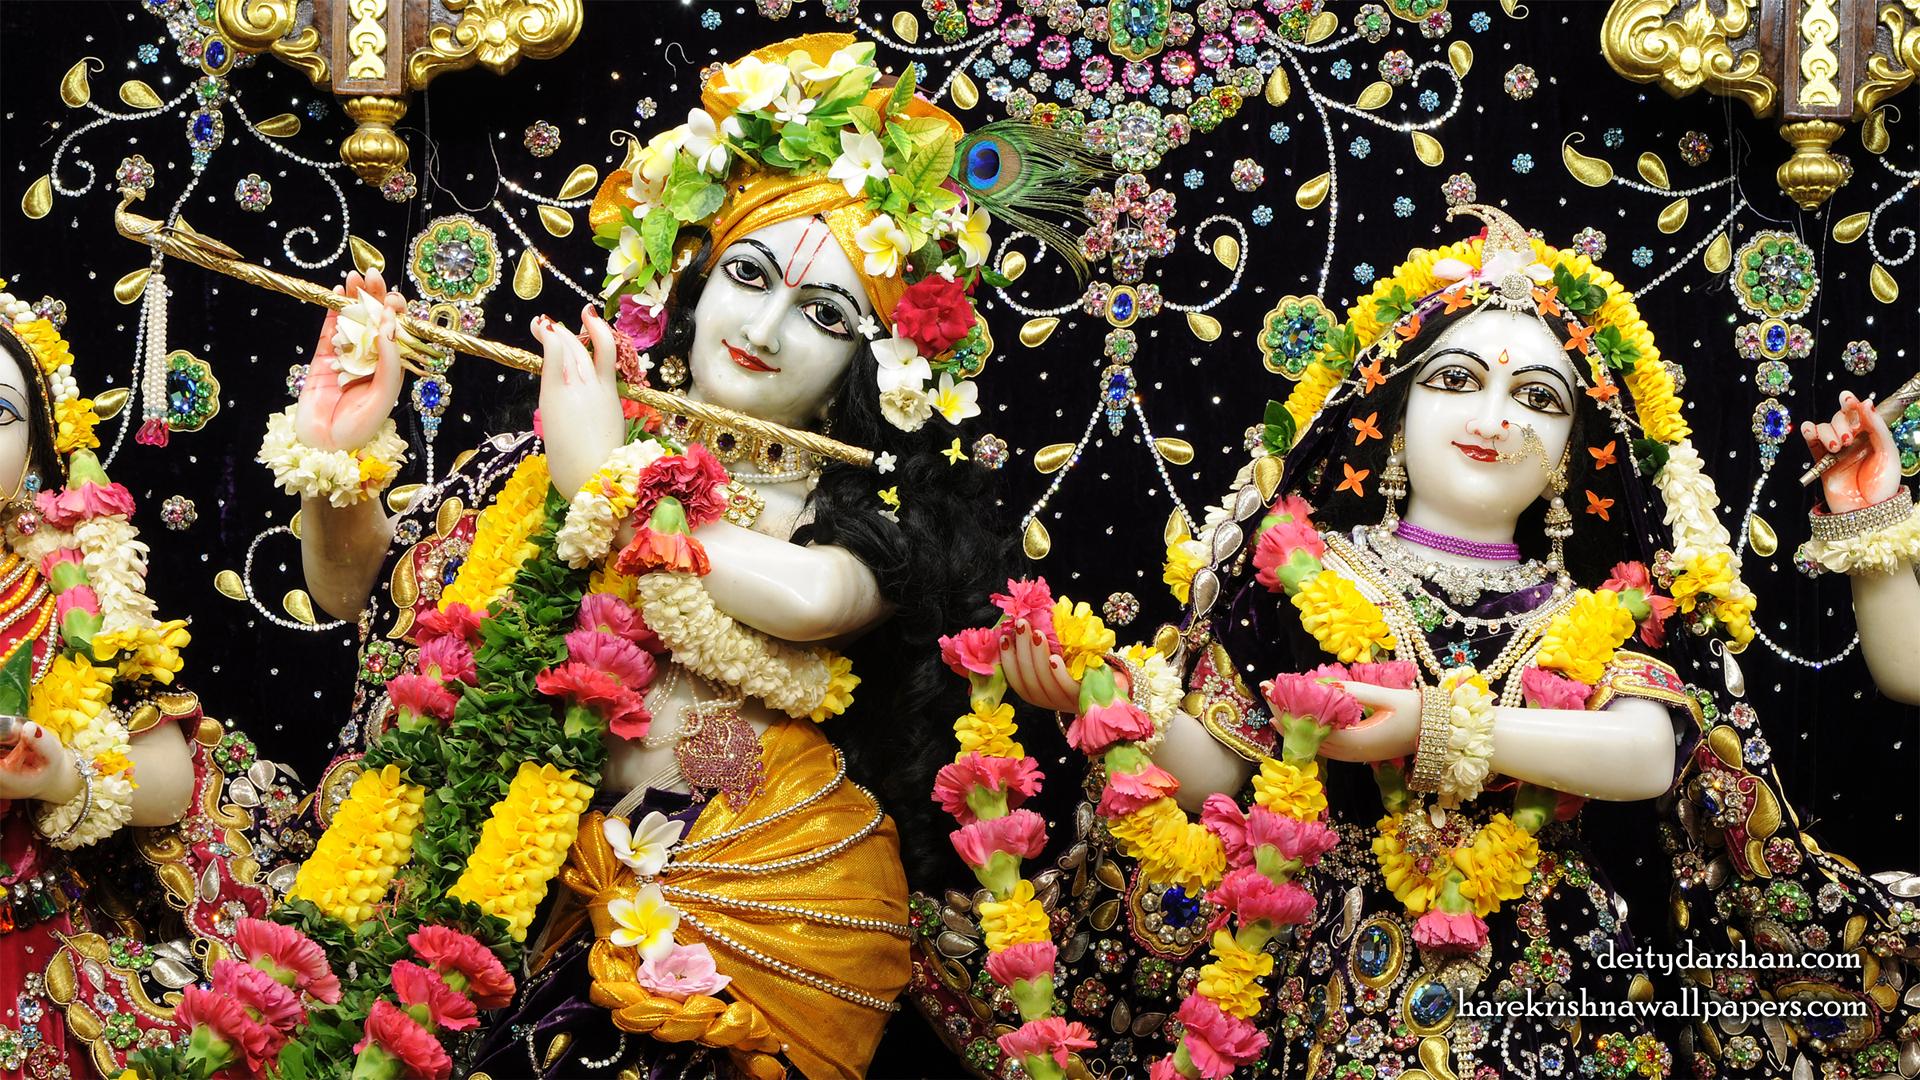 Sri Sri Radha Gopinath Close up Wallpaper (058) Size 1920x1080 Download